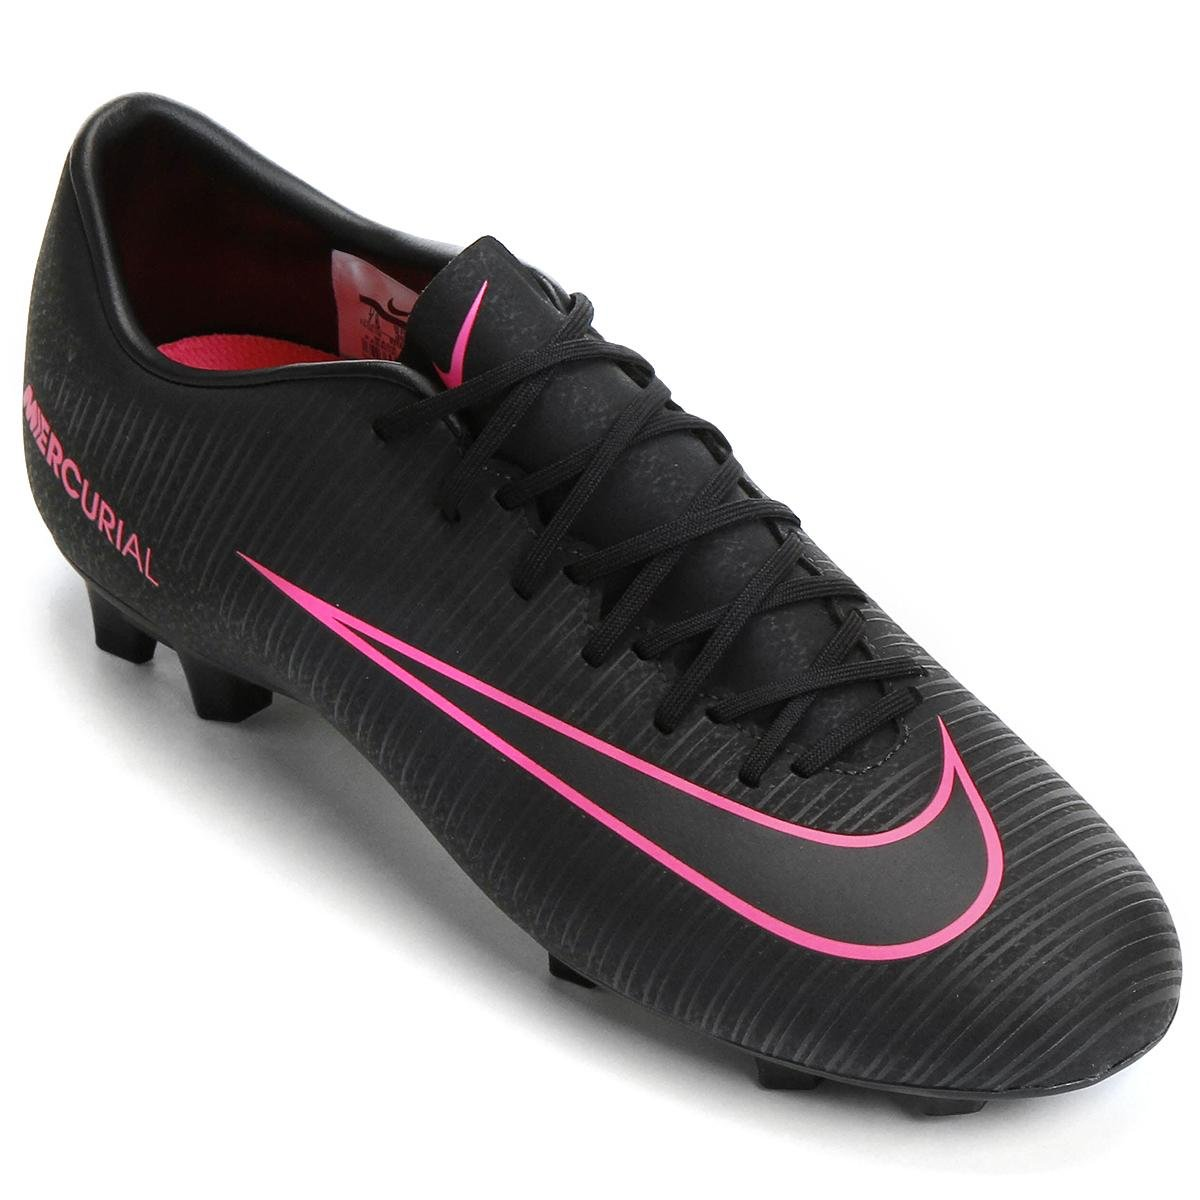 Chuteira Campo Nike Mercurial Victory 6 FG - Compre Agora  322eb75193eac